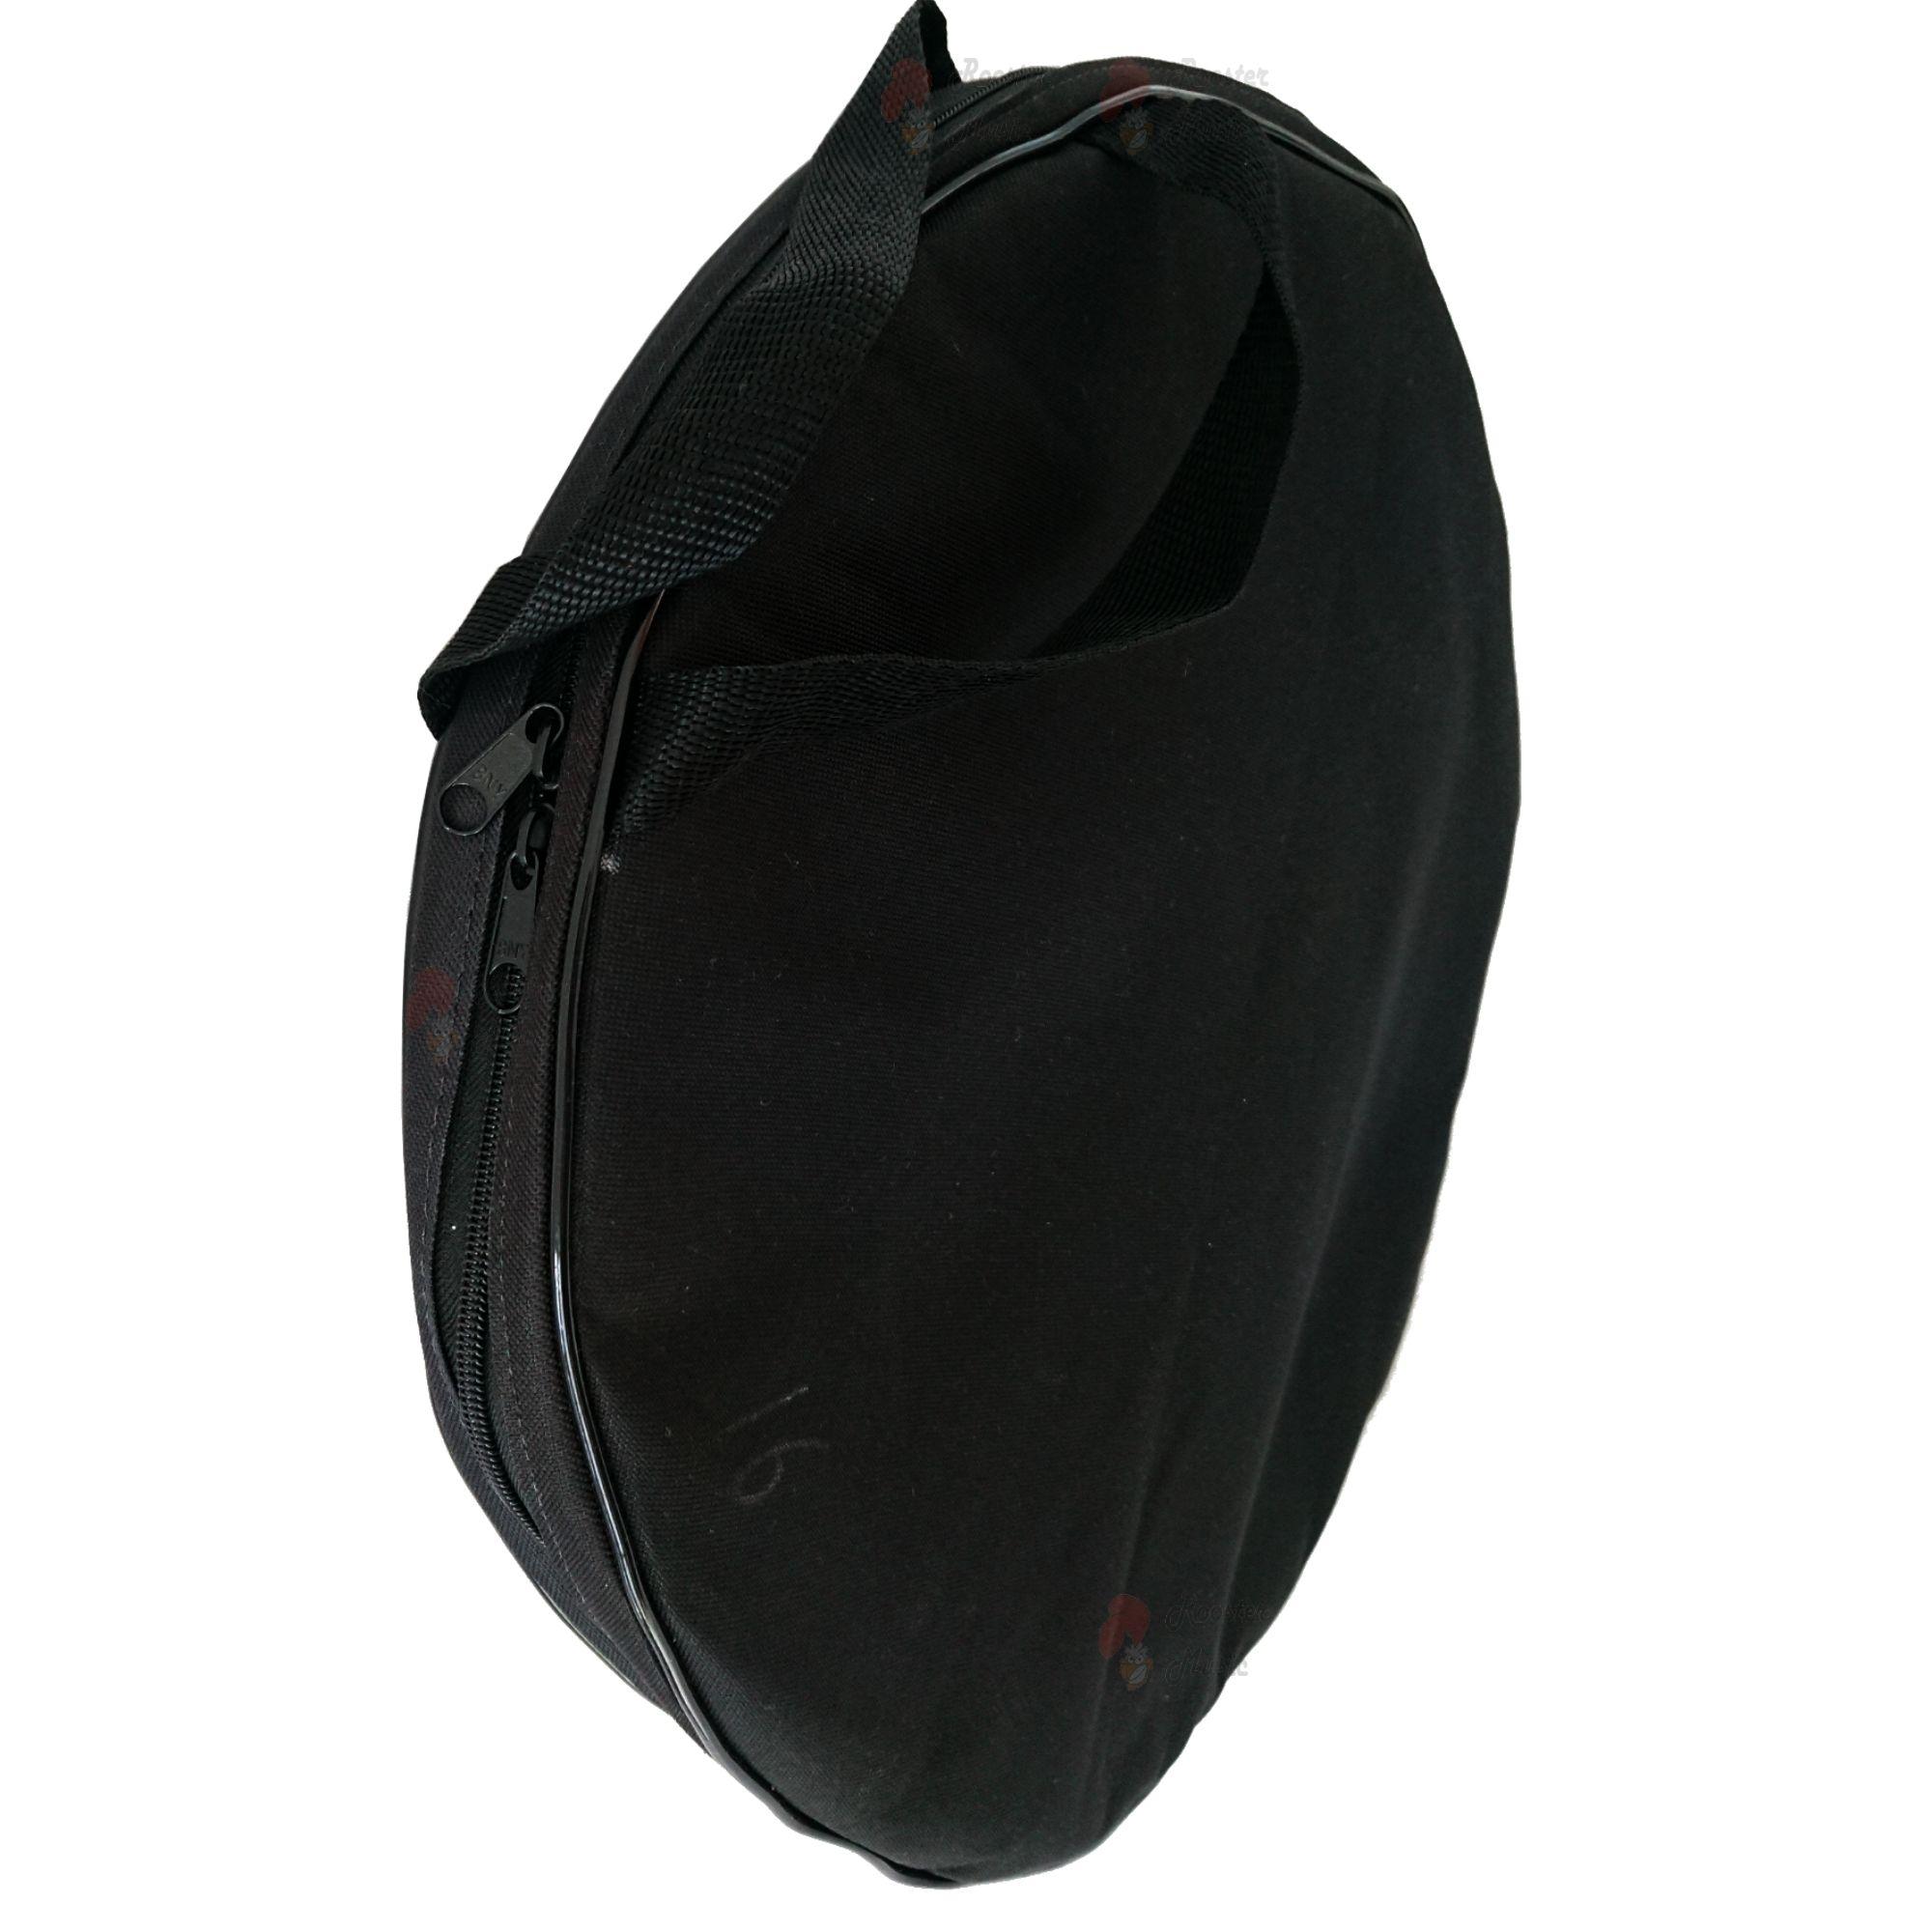 "Capa para Porta Prato Simples 20"" Luxo"